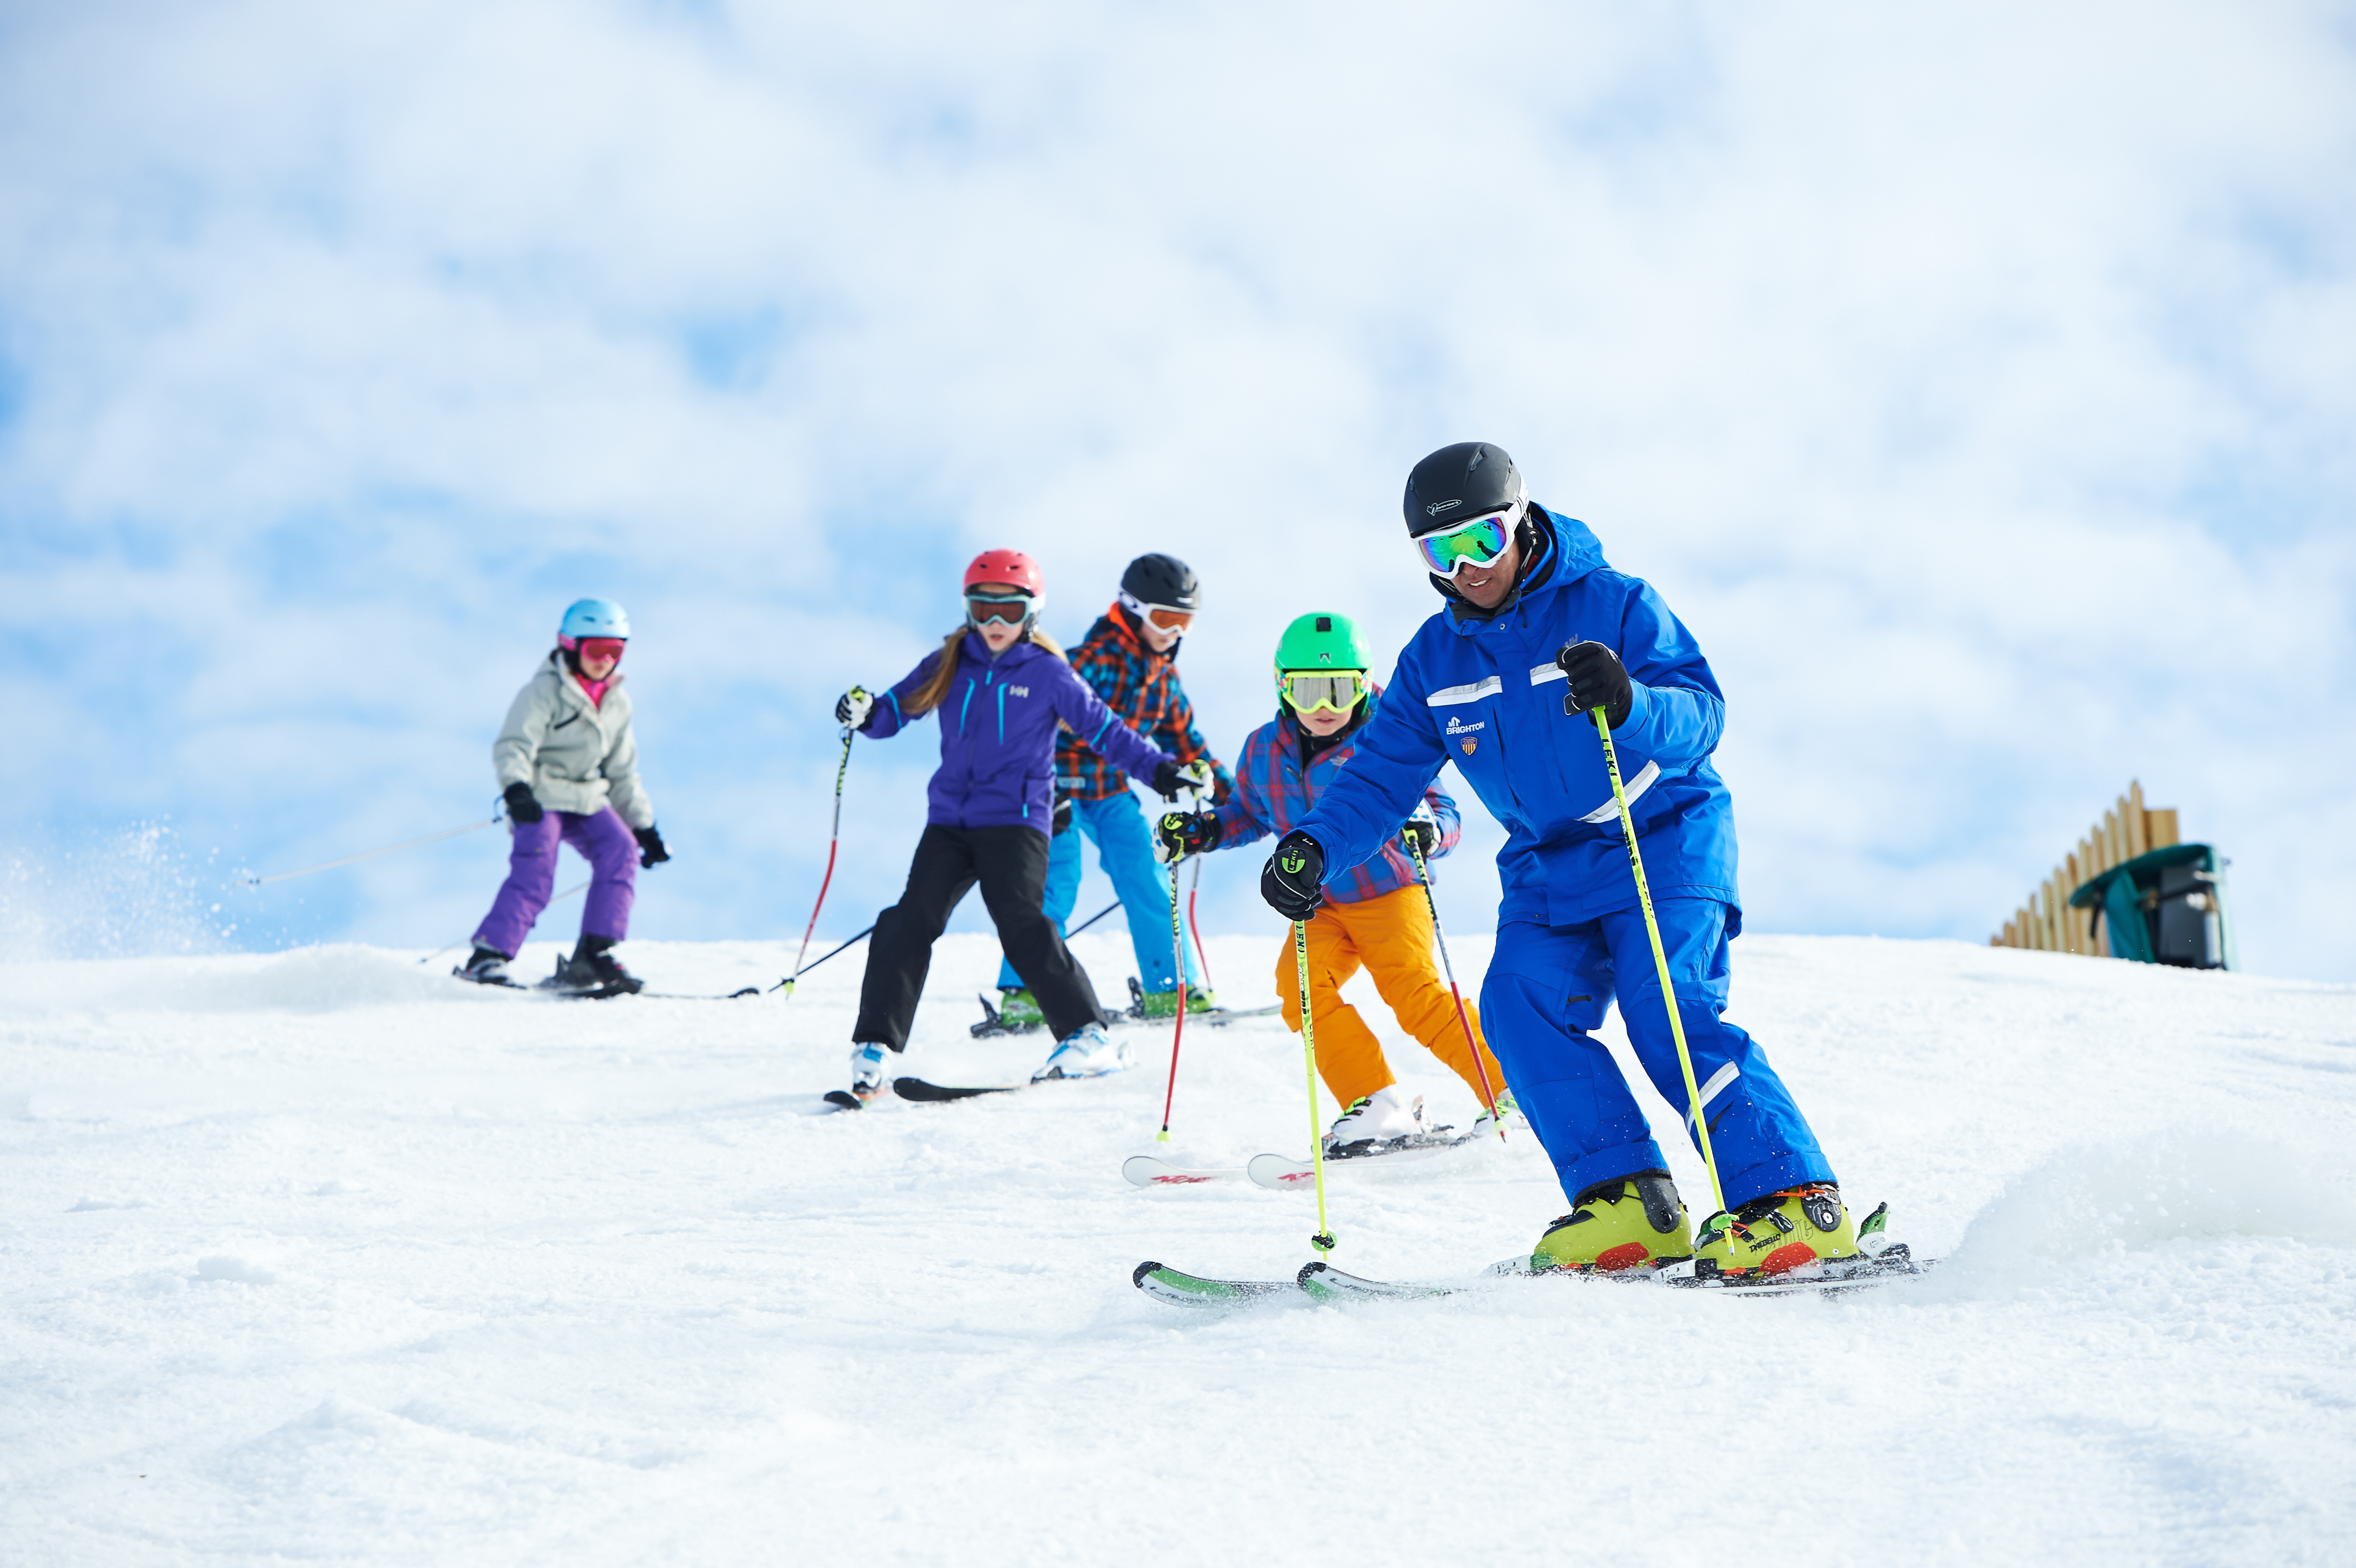 171207-ski-destinations-mt-brighton-ann-arbor-michigan